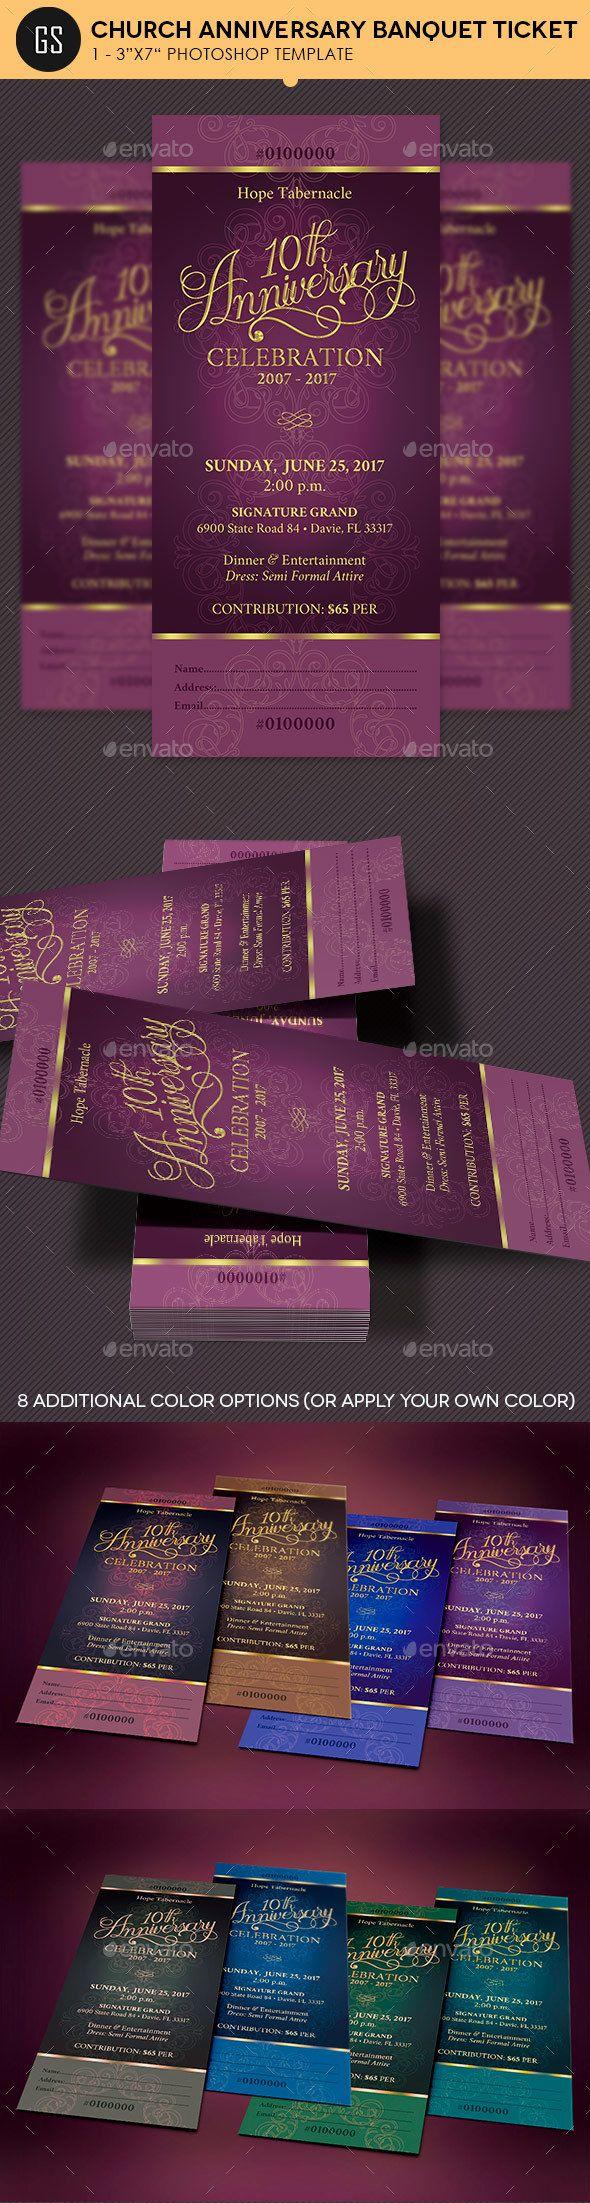 church anniversary banquet ticket miscellaneous print templates